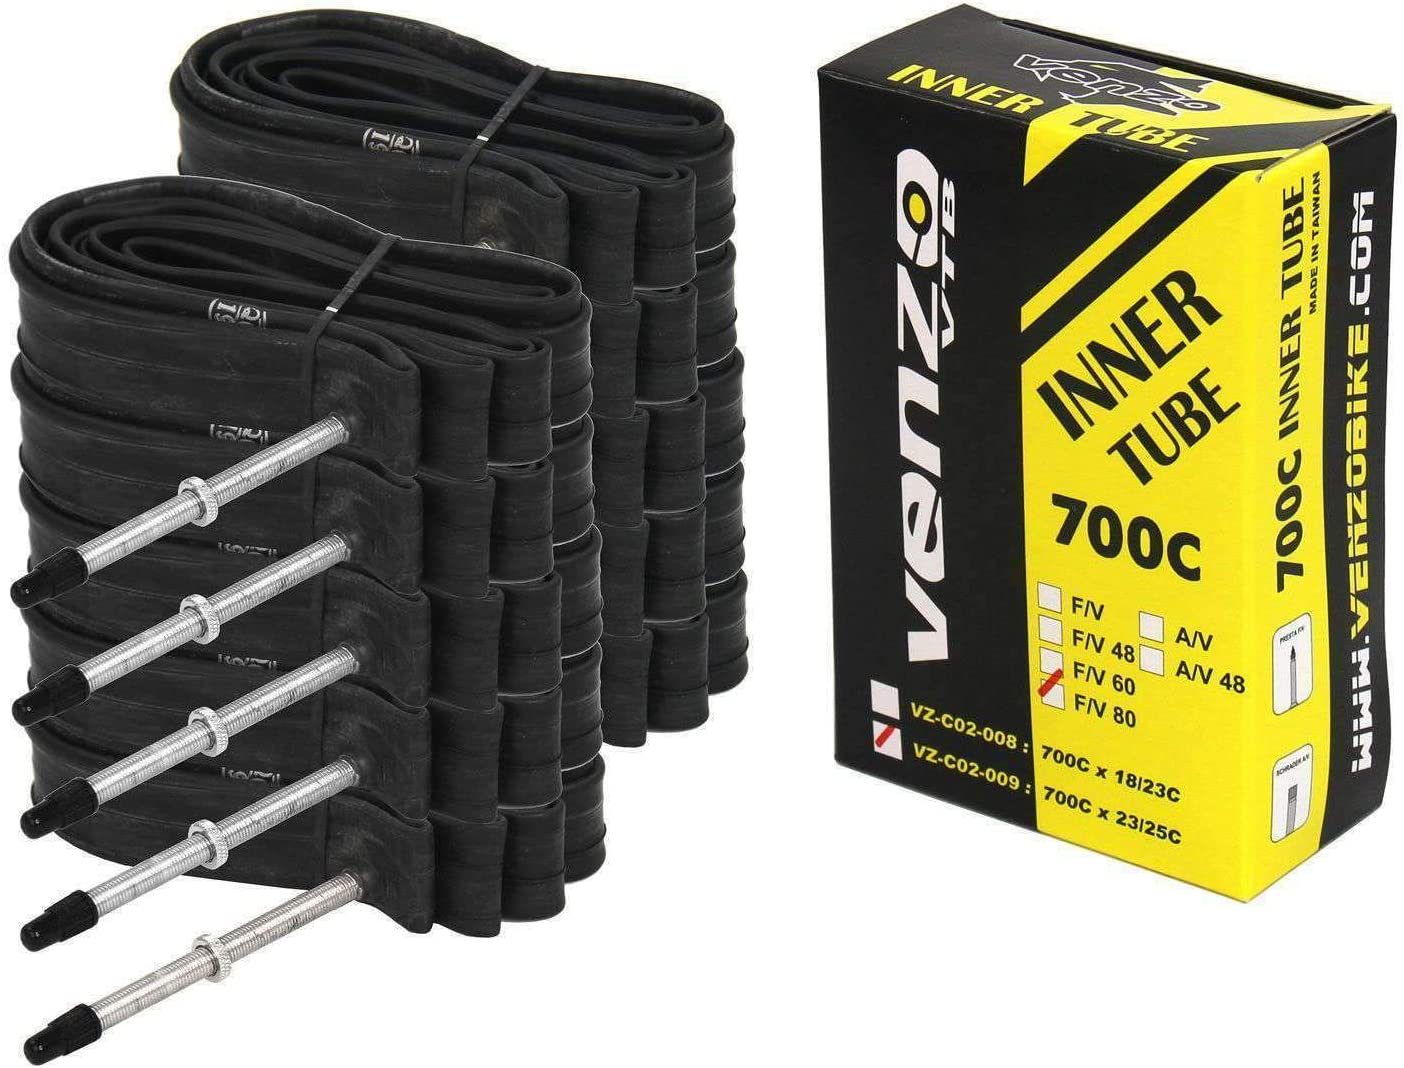 Kenda 700x18-25c presta 32mm valve road bicycle inner tube bike 4 pack